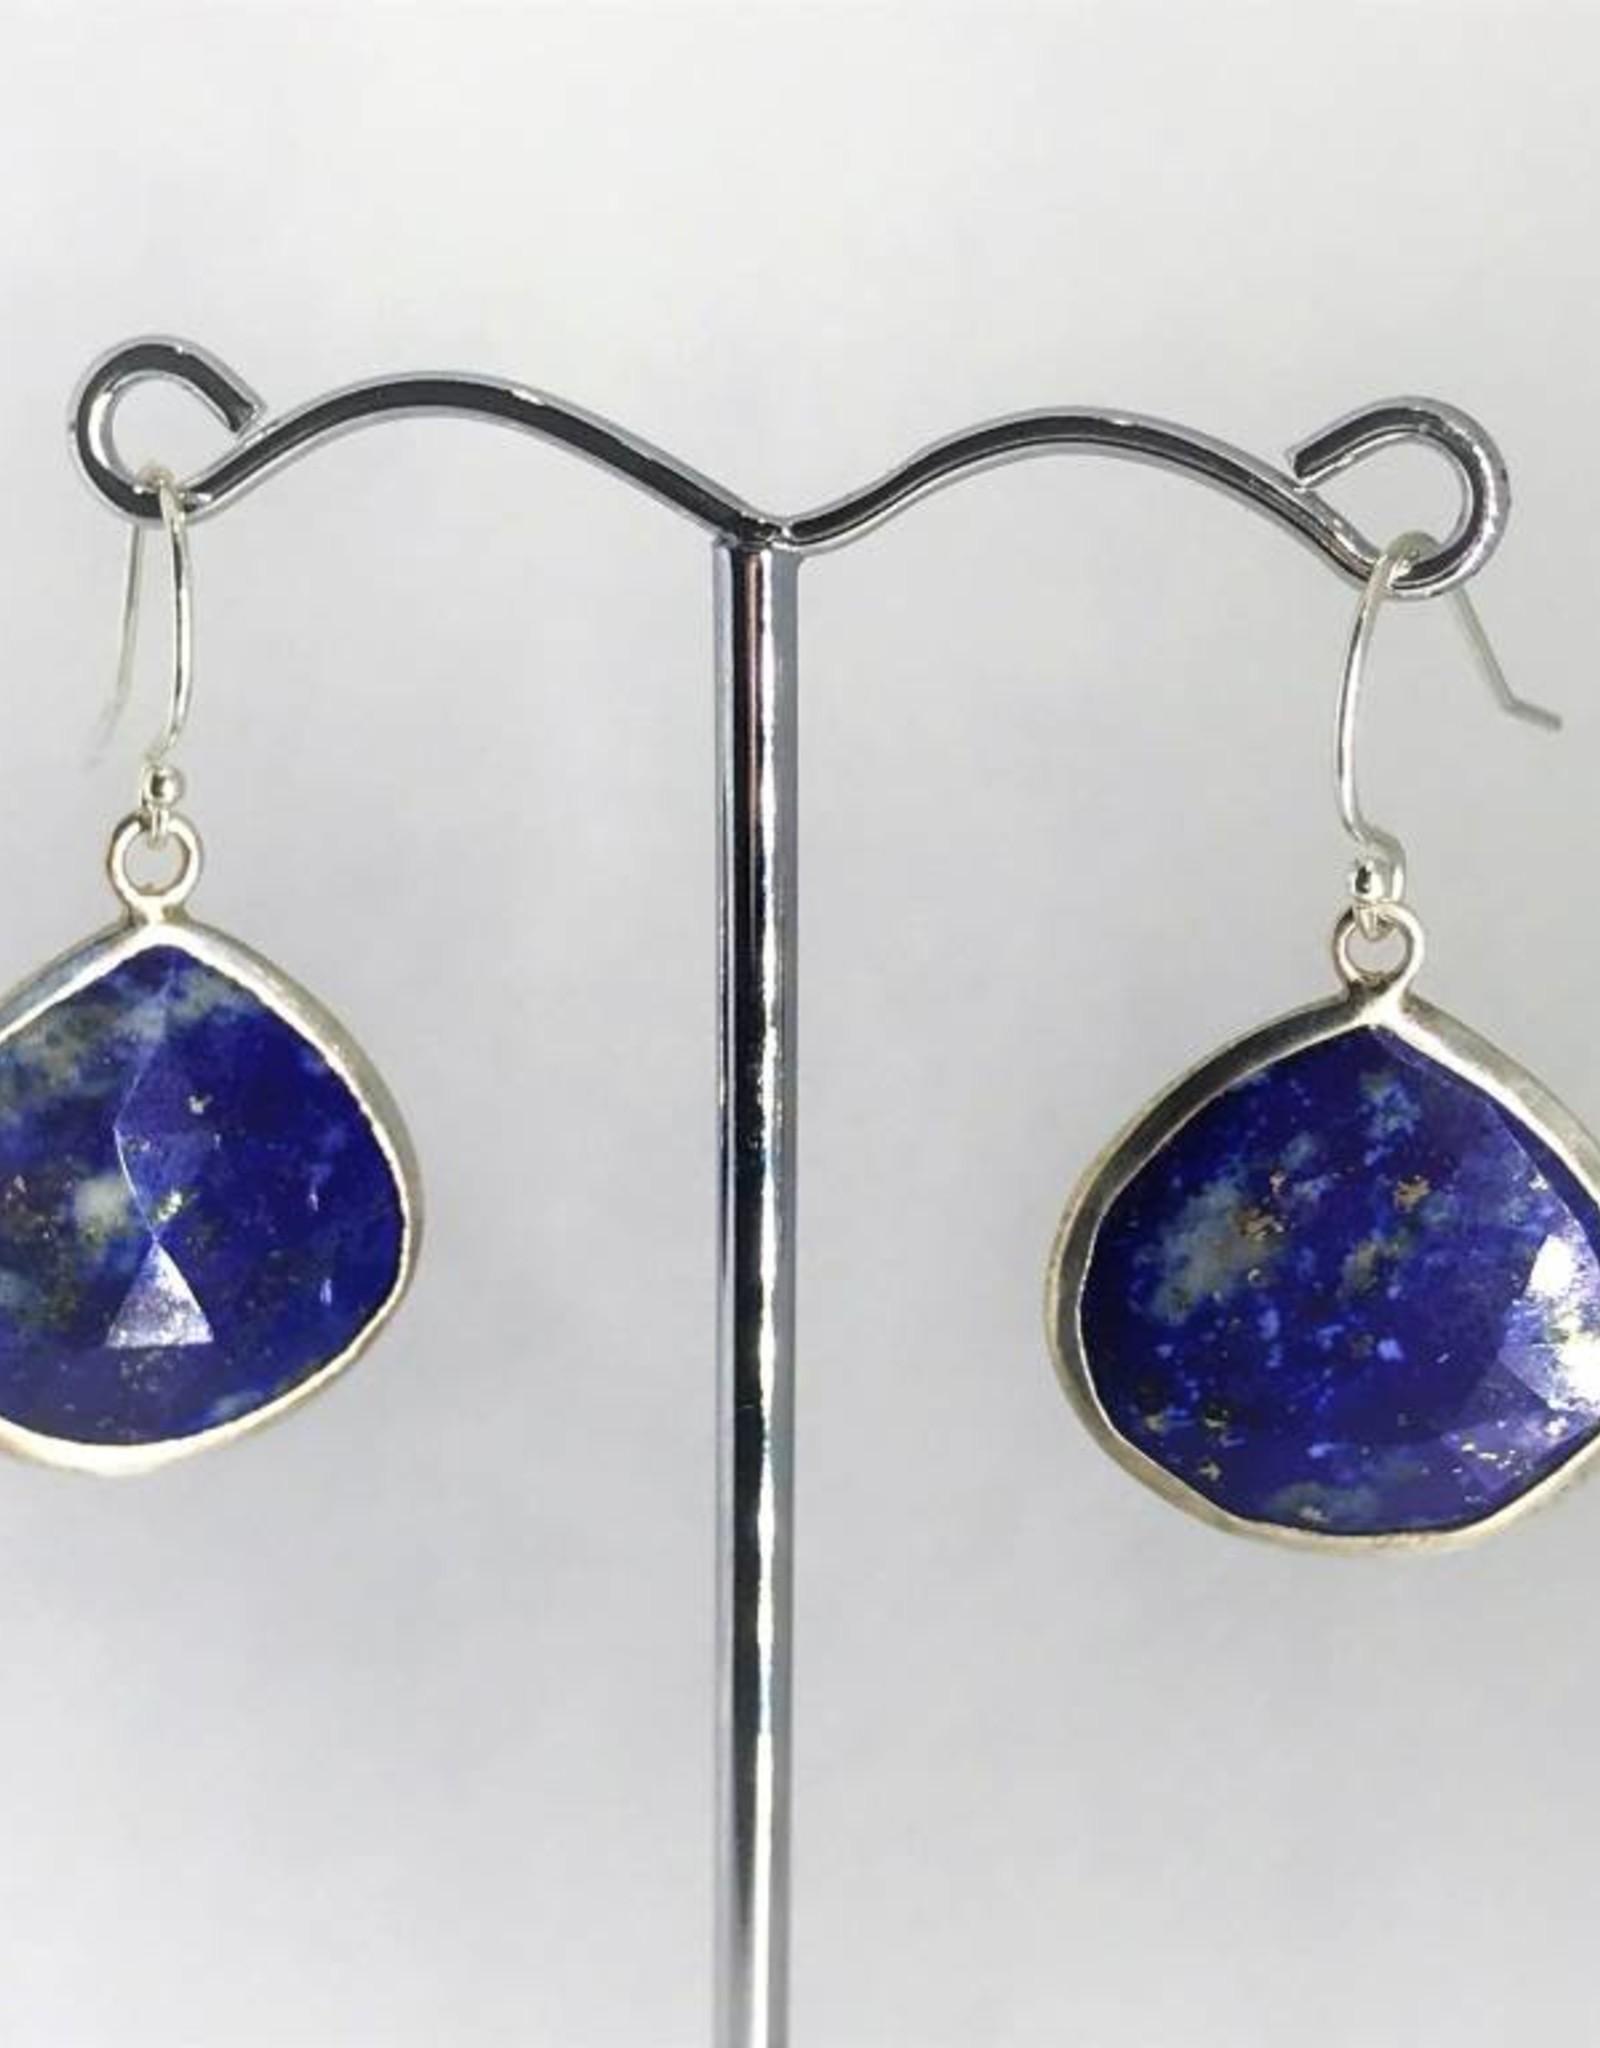 Pendant Earrings - Lapis/Silver